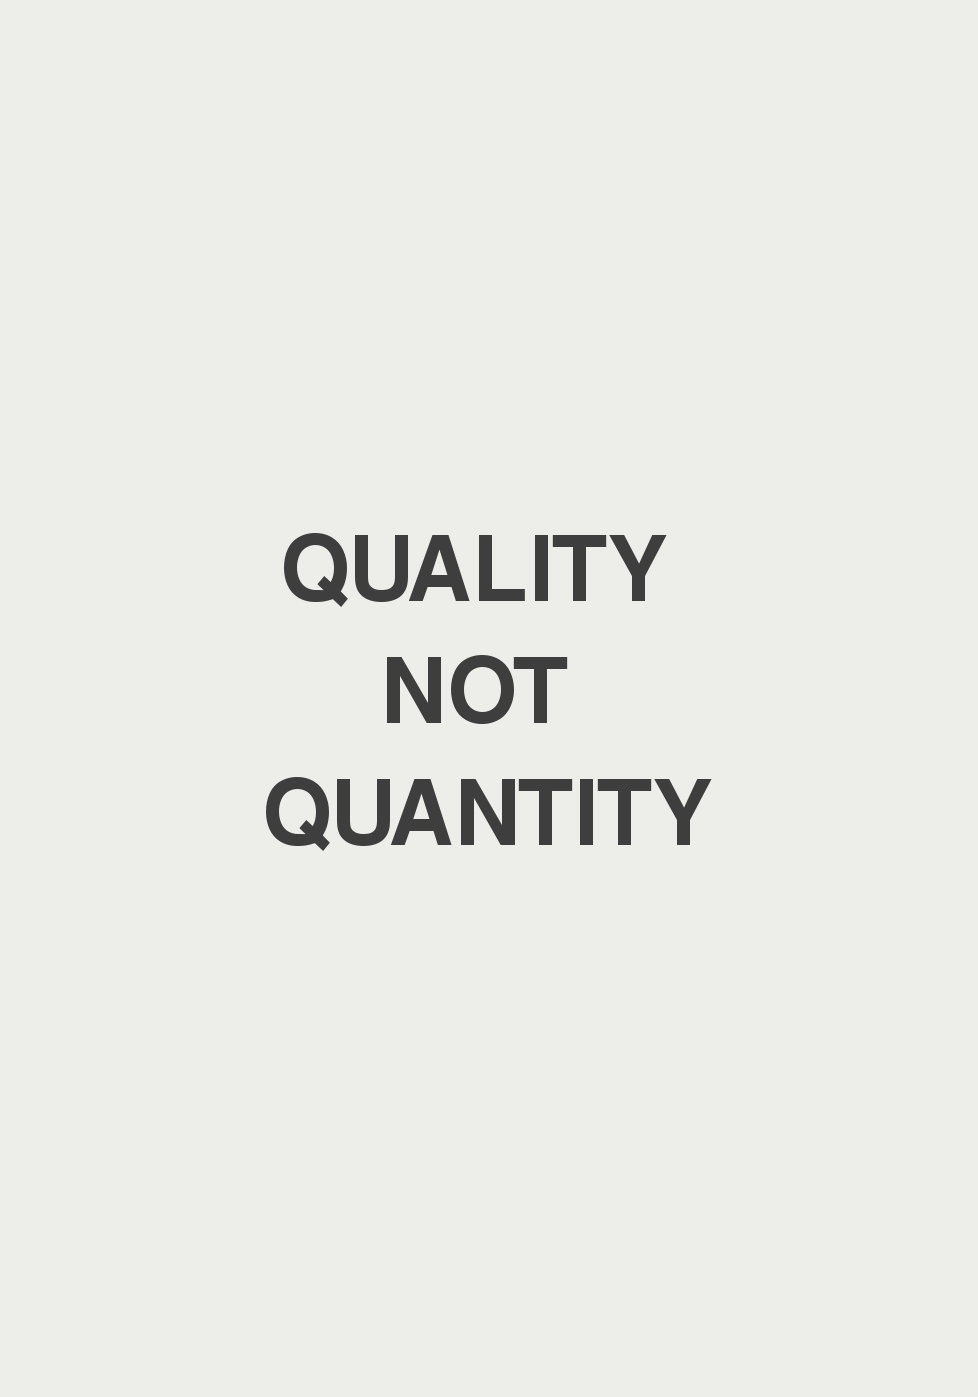 quality not quantity.jpg